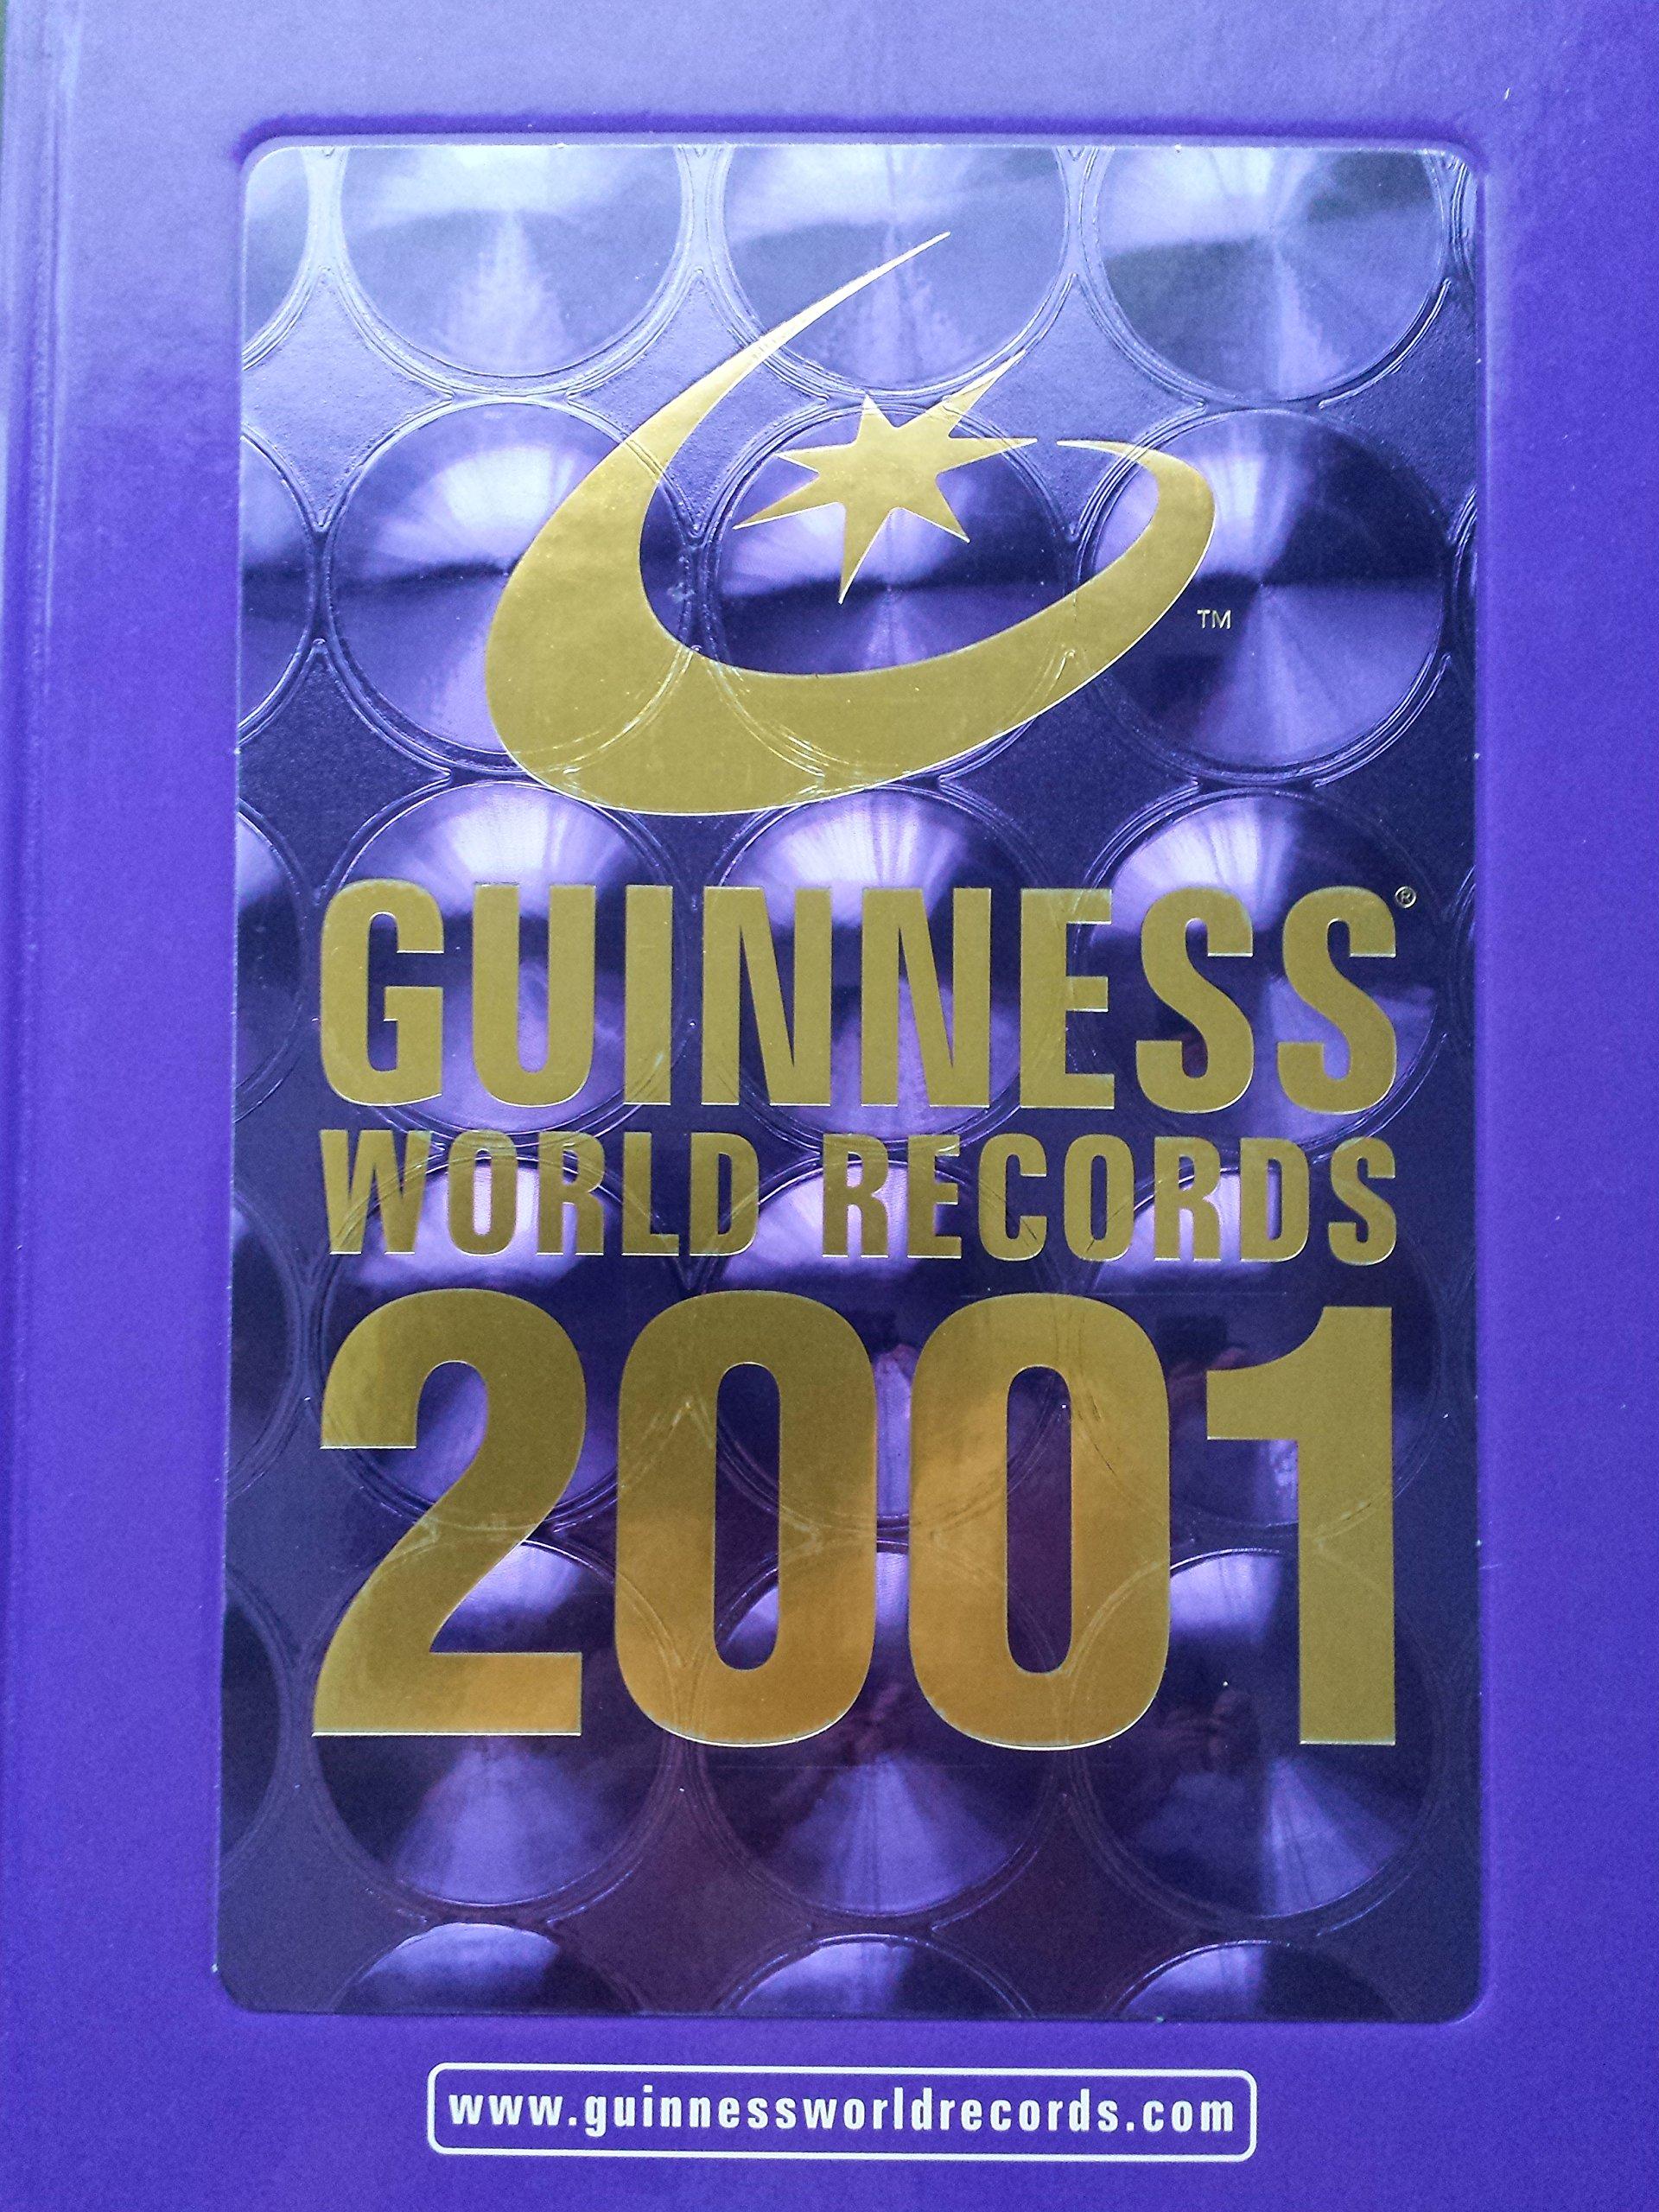 Guinness world records 2001 editor 9781892051011 amazon books ccuart Gallery